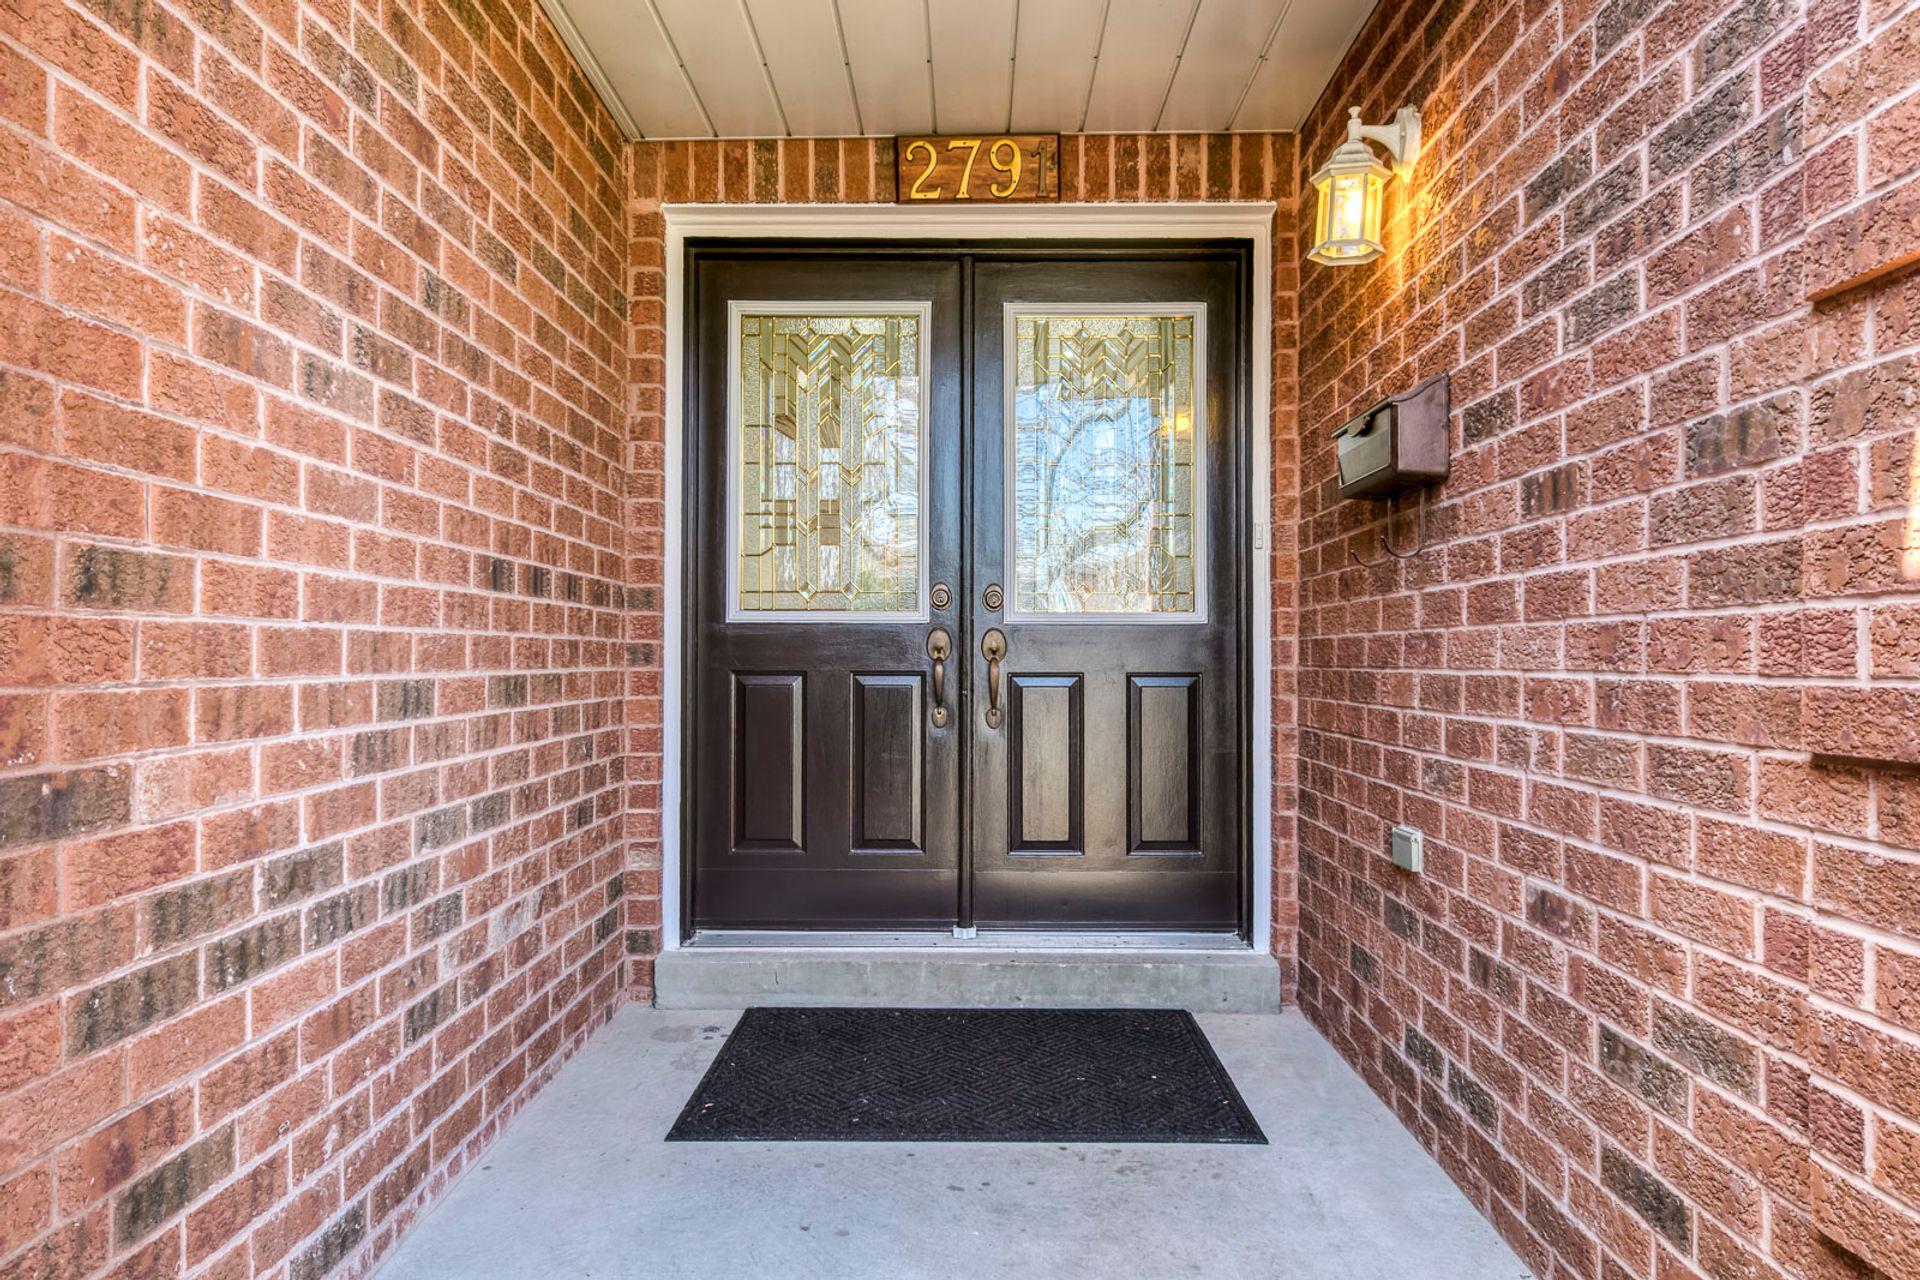 Exterior - 2791 Mahogany Lane, Oakville - Elite3 & Team at 2791 Mahogany Lane, Clearview, Oakville